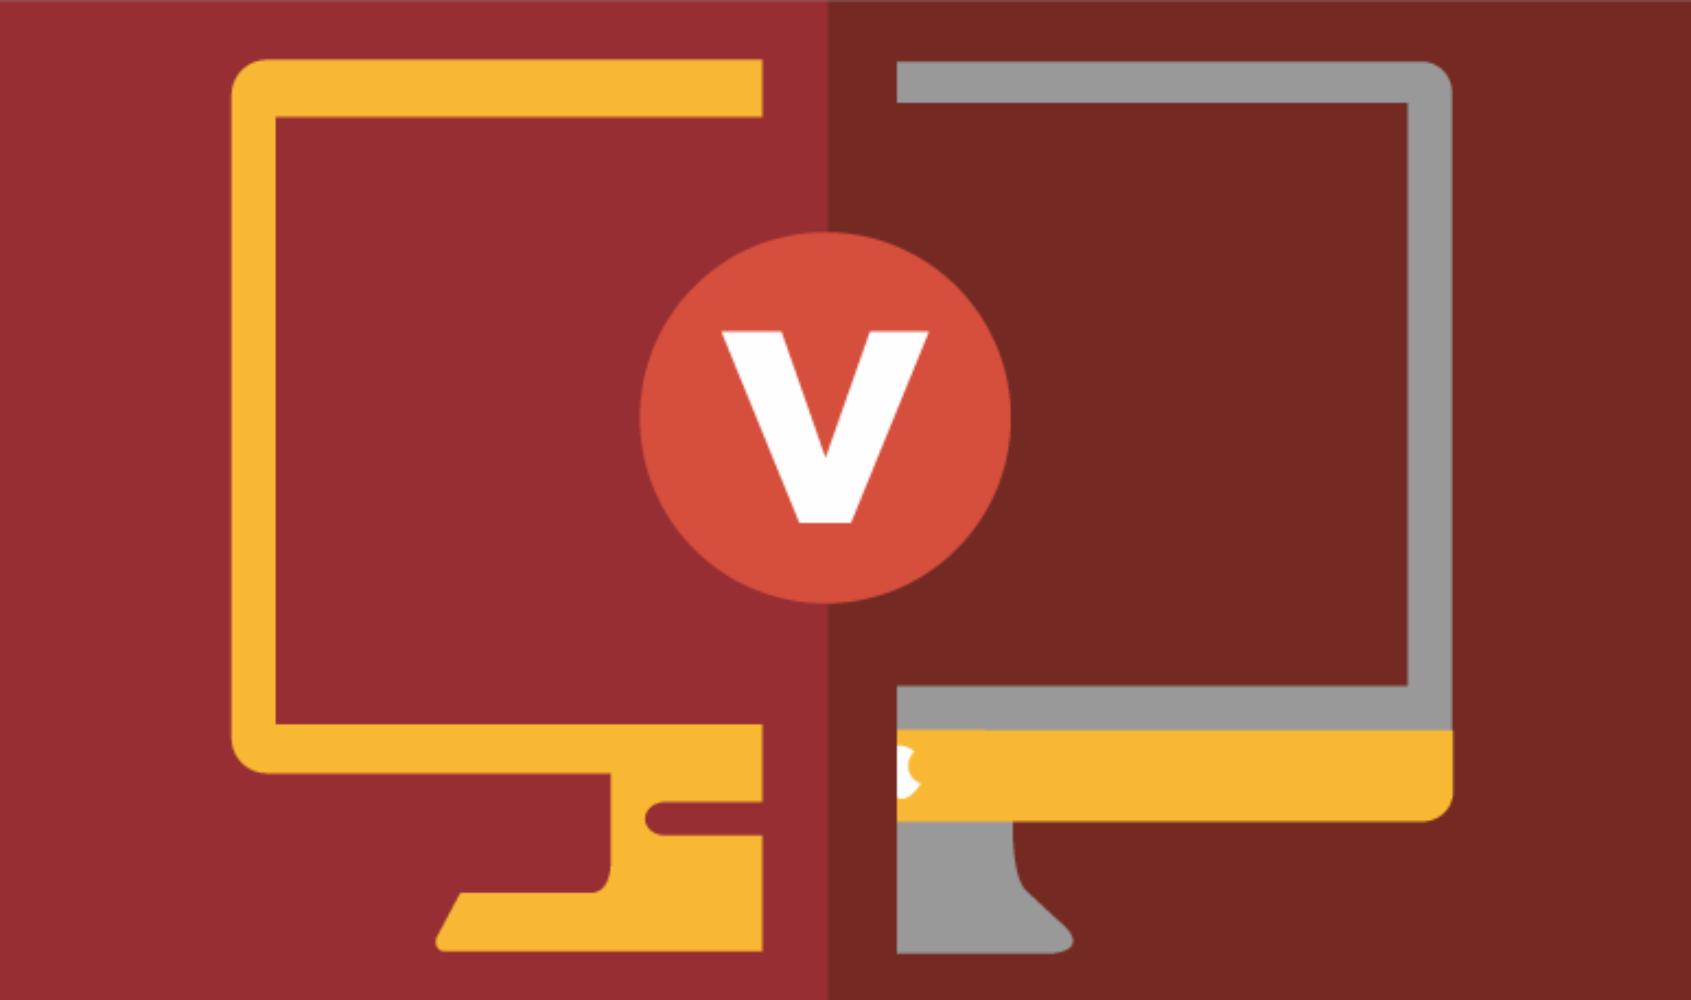 iOS vs windows 10 article thumbnail